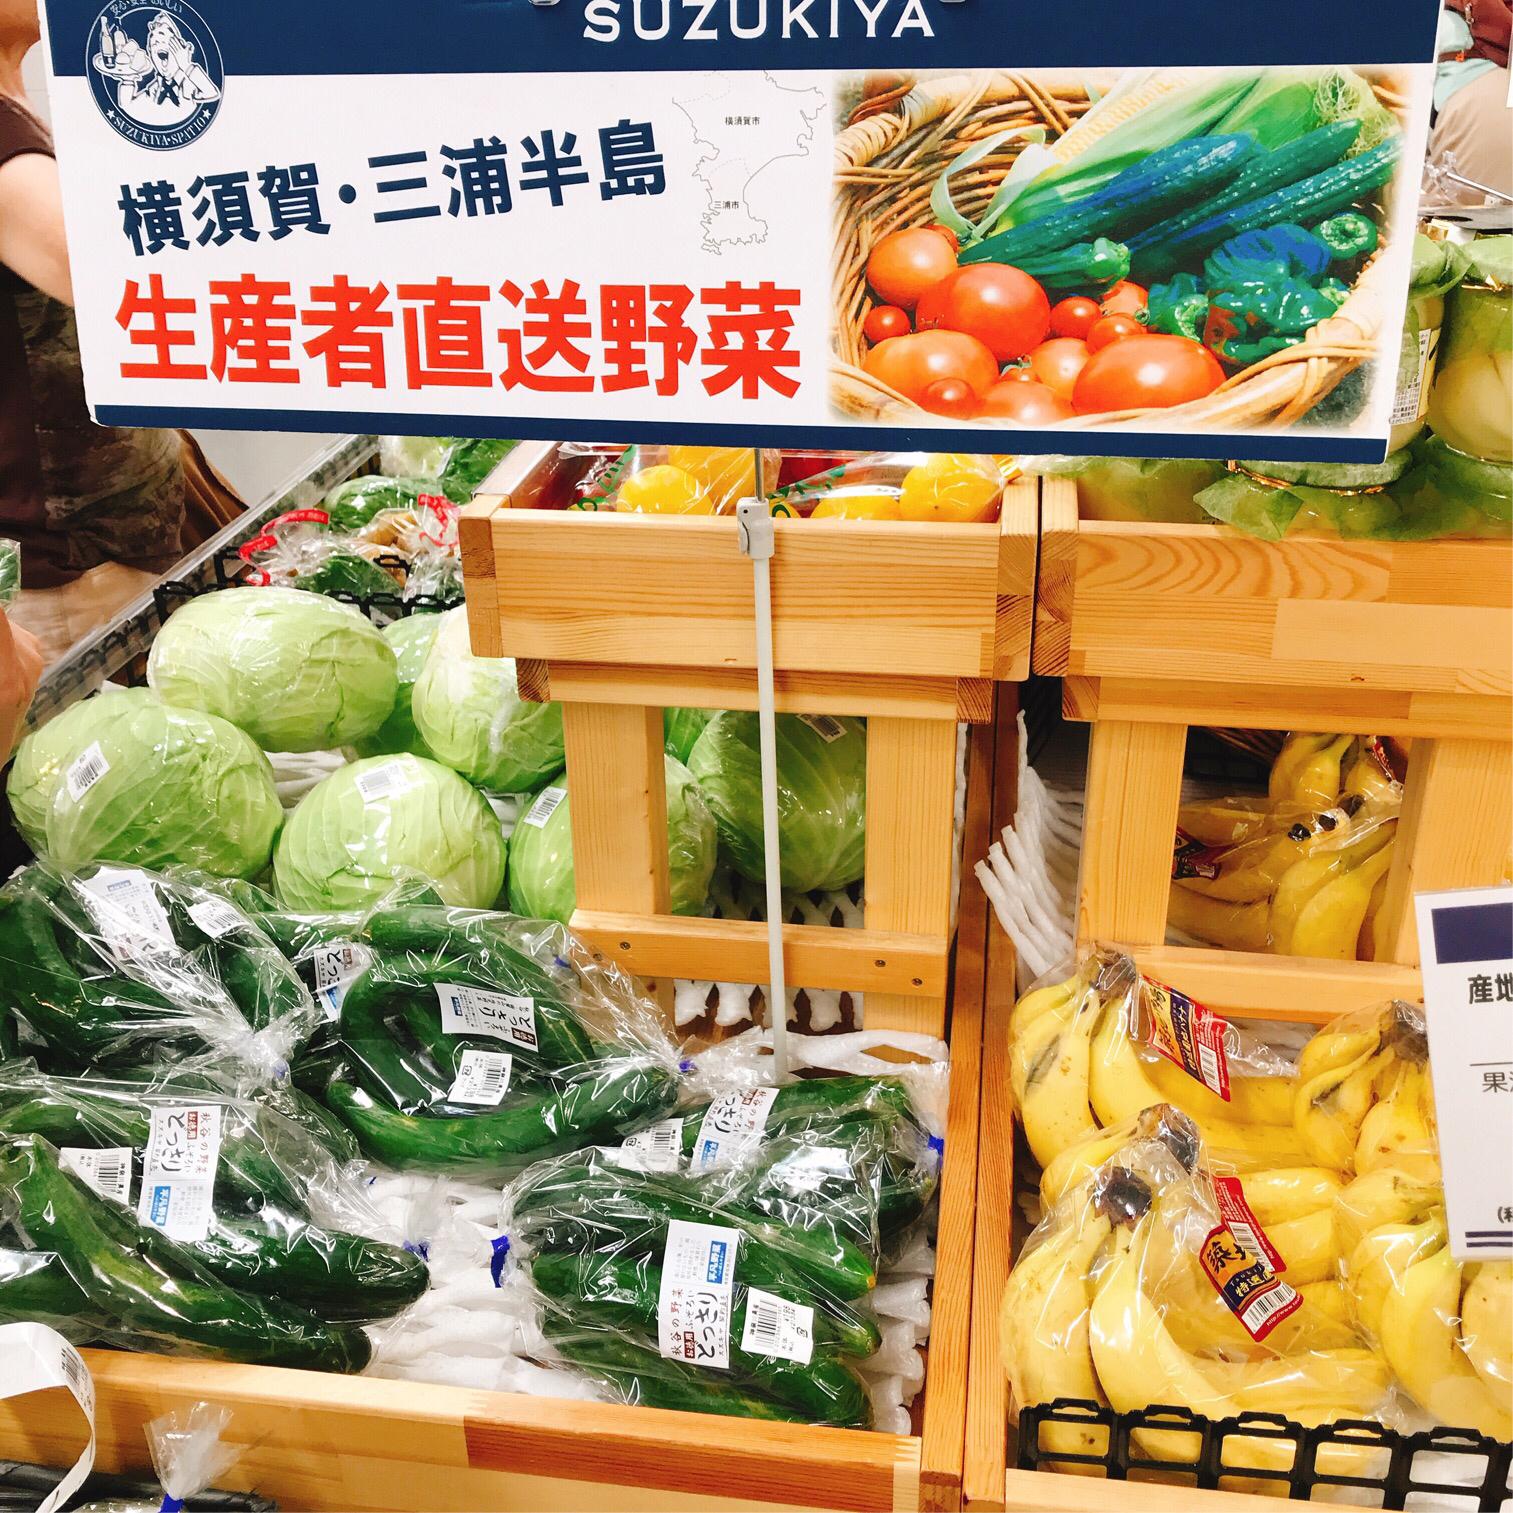 SUZUKIYA直送のお野菜。新鮮で美味しそう。